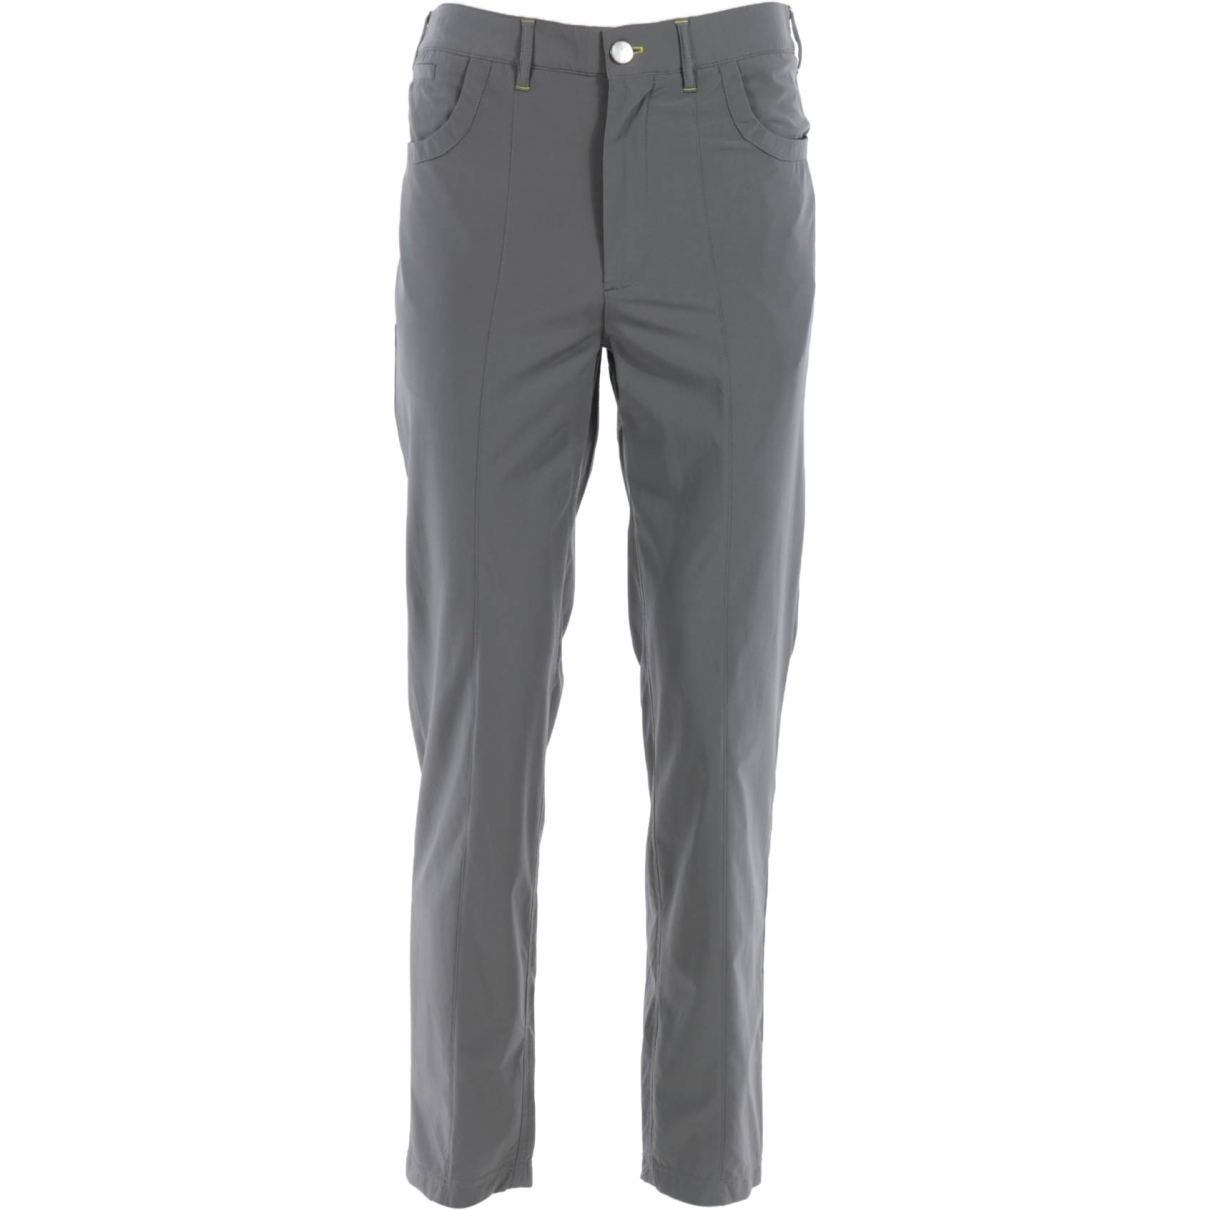 Emporio Armani \N Grey Cotton Trousers for Men M International